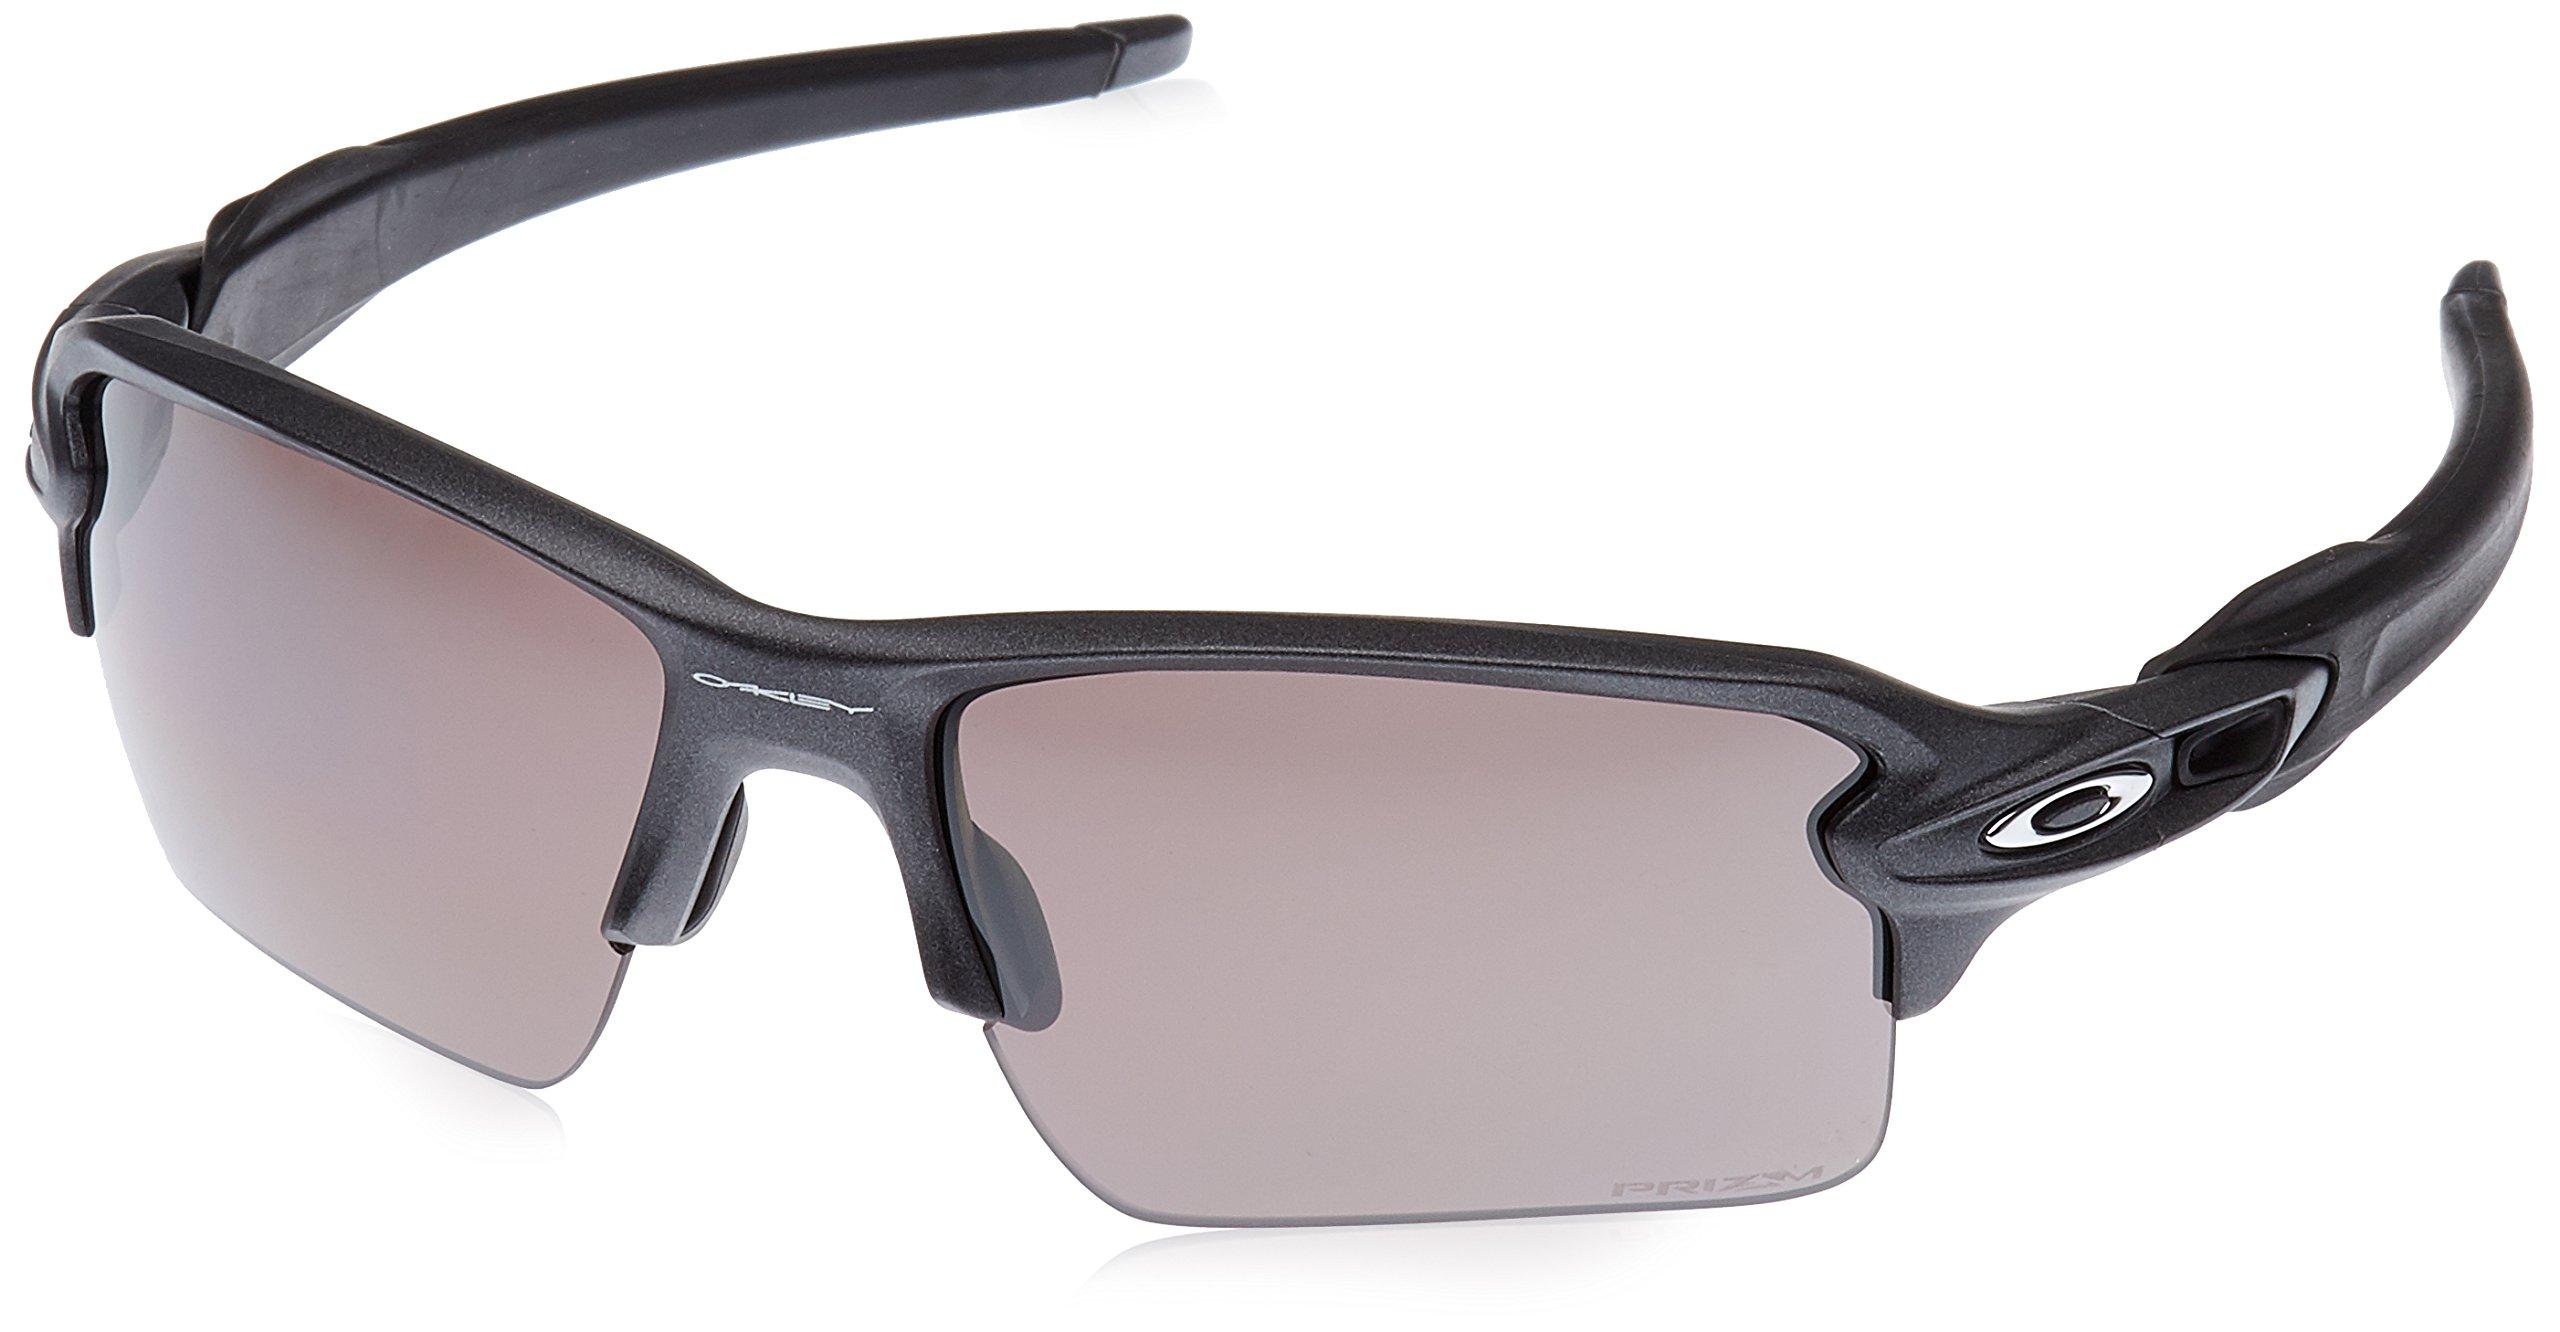 Oakley Men's Flak 2.0 XL Polarized Iridium Rectangular Sunglasses, Steel, 59.0 mm